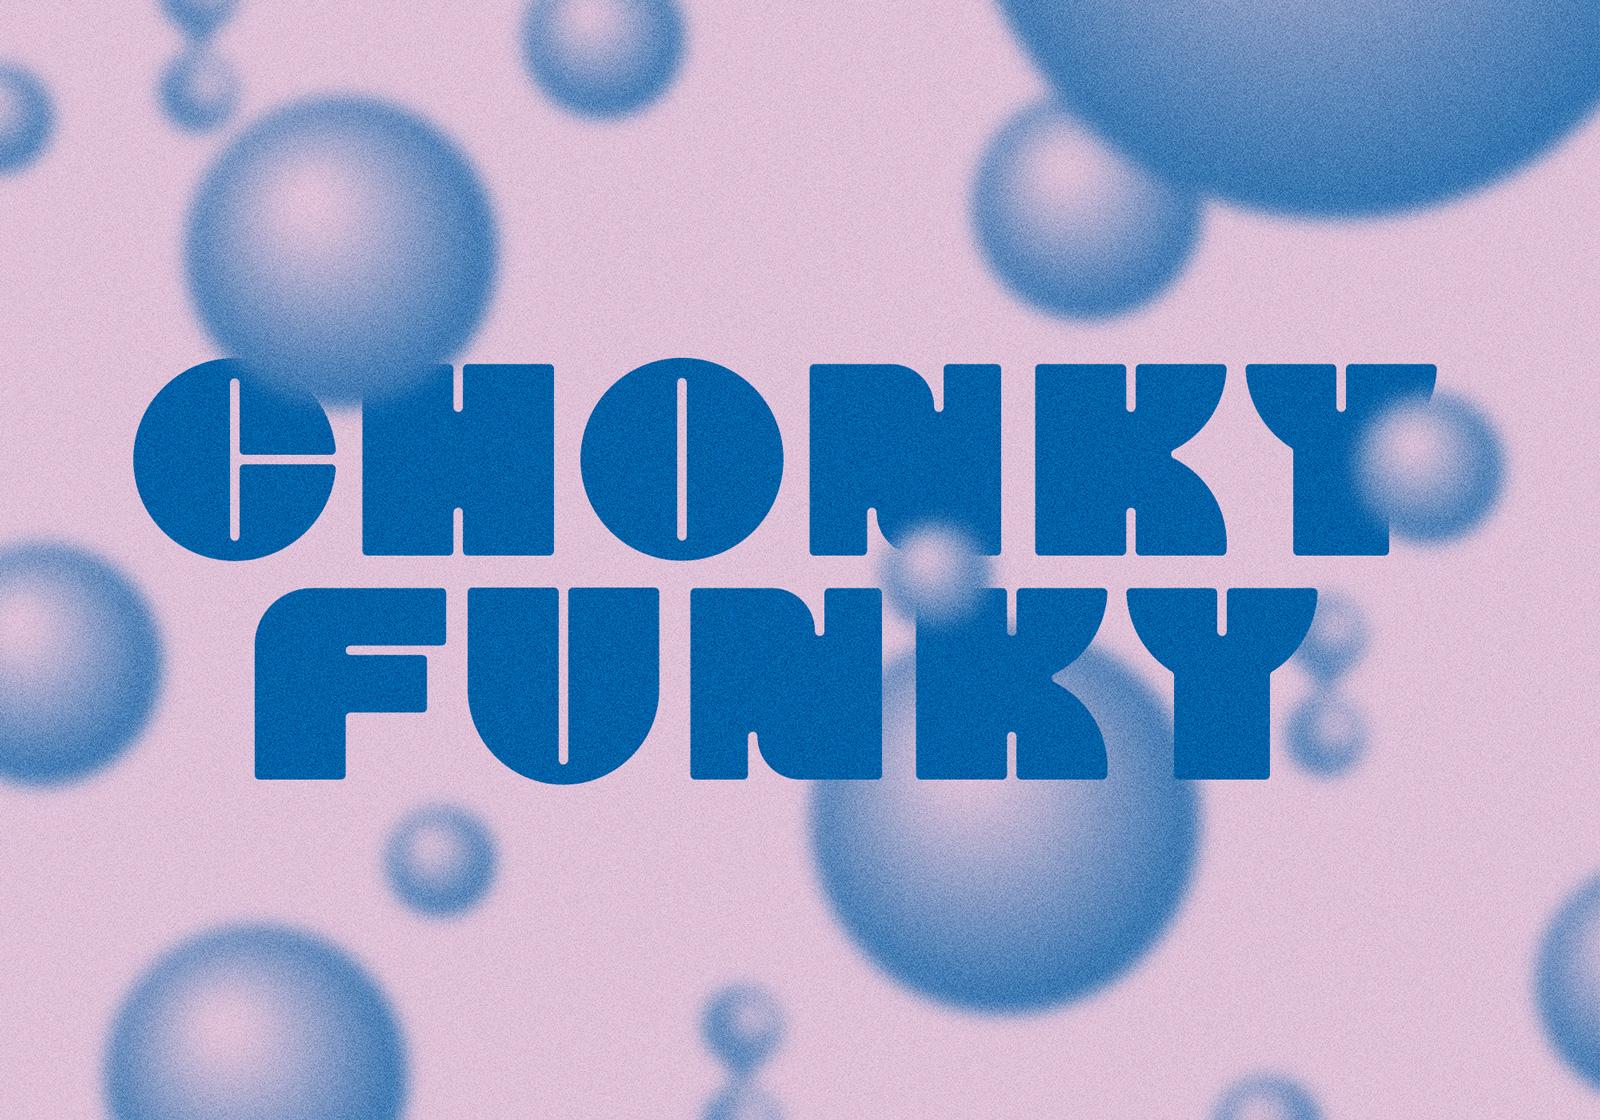 Chonky_font_6